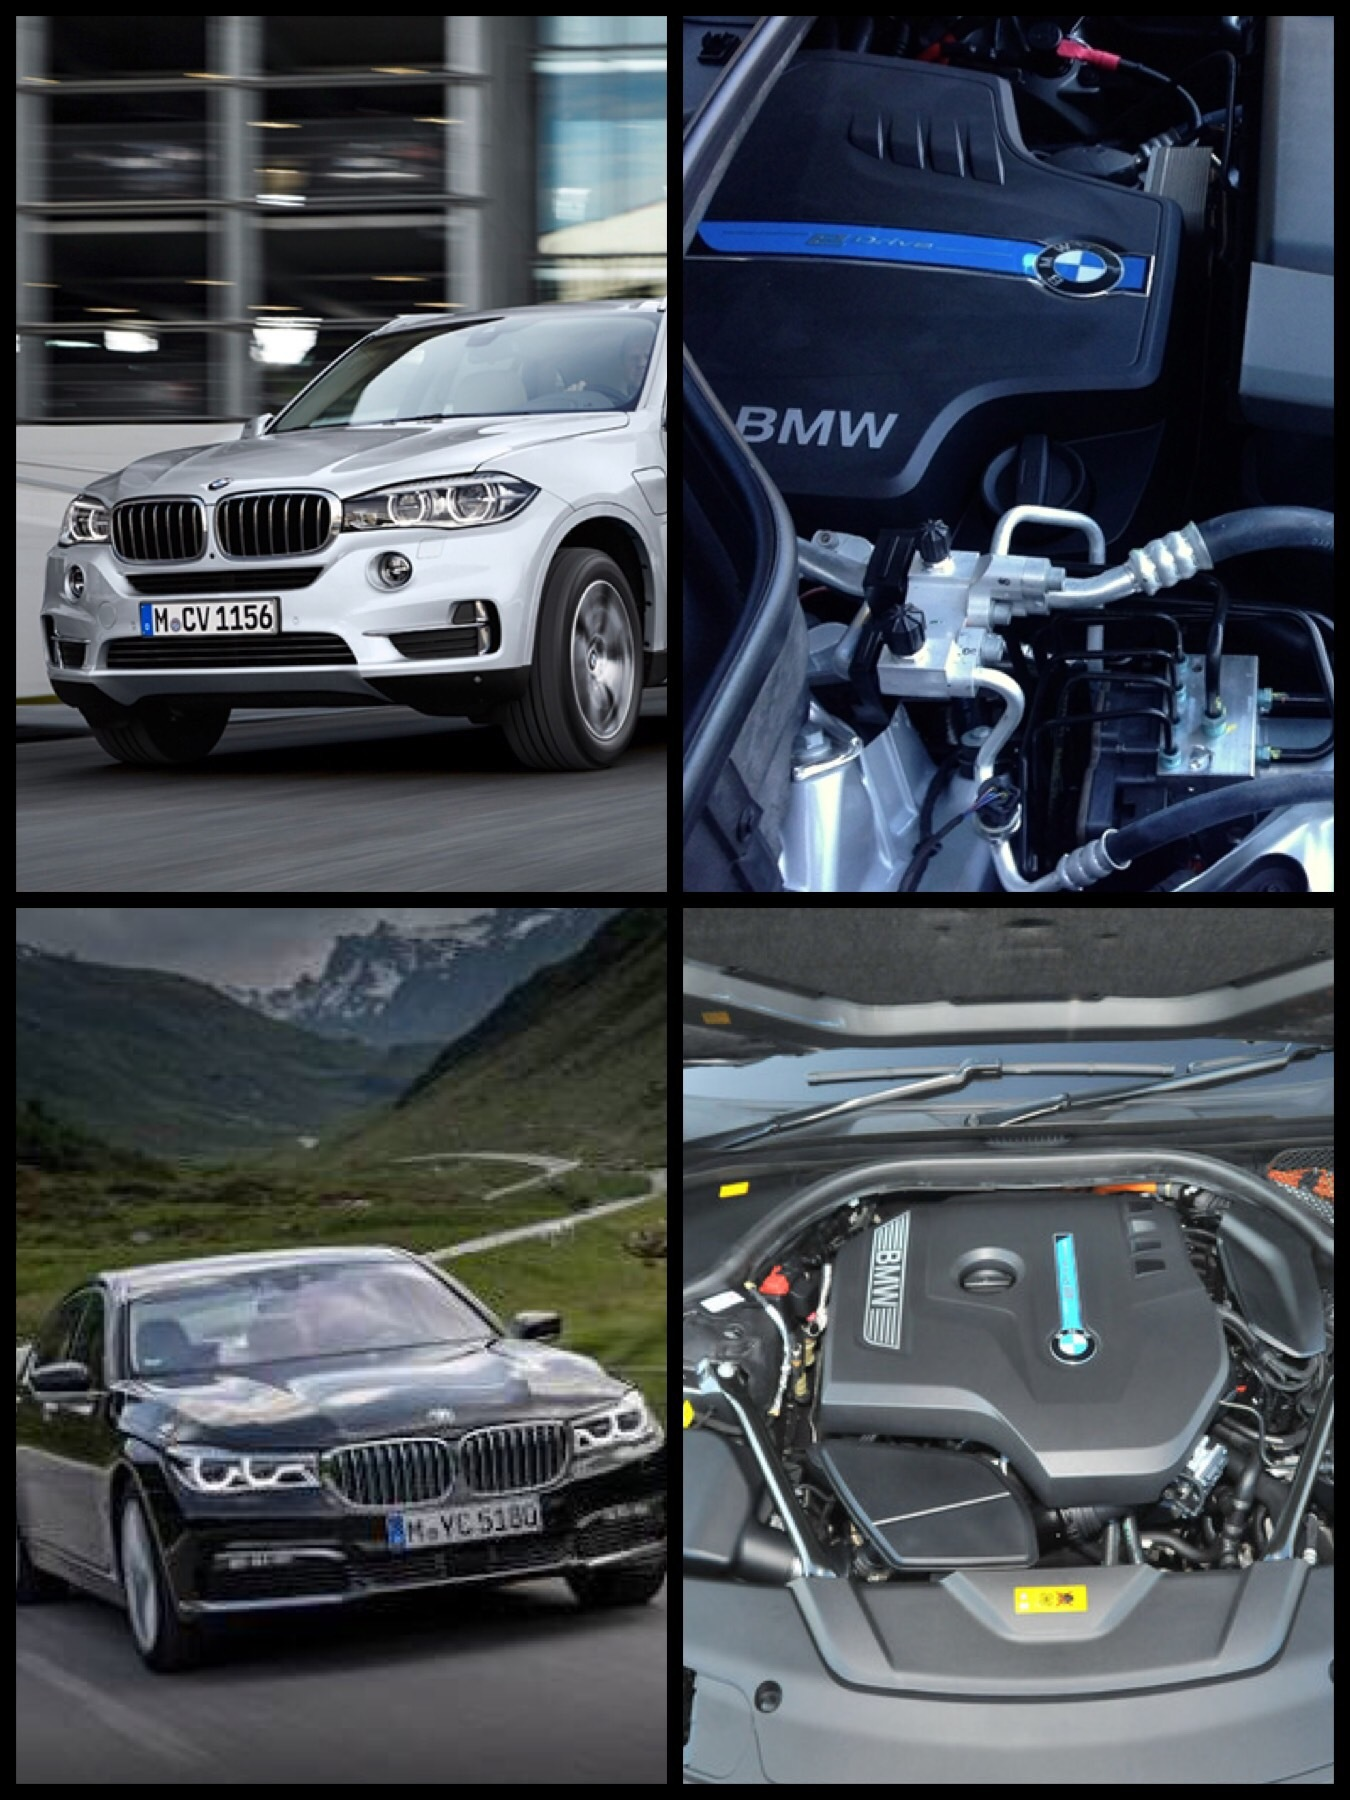 BMW 740e iパフォーマンス・X5 xDrive40e